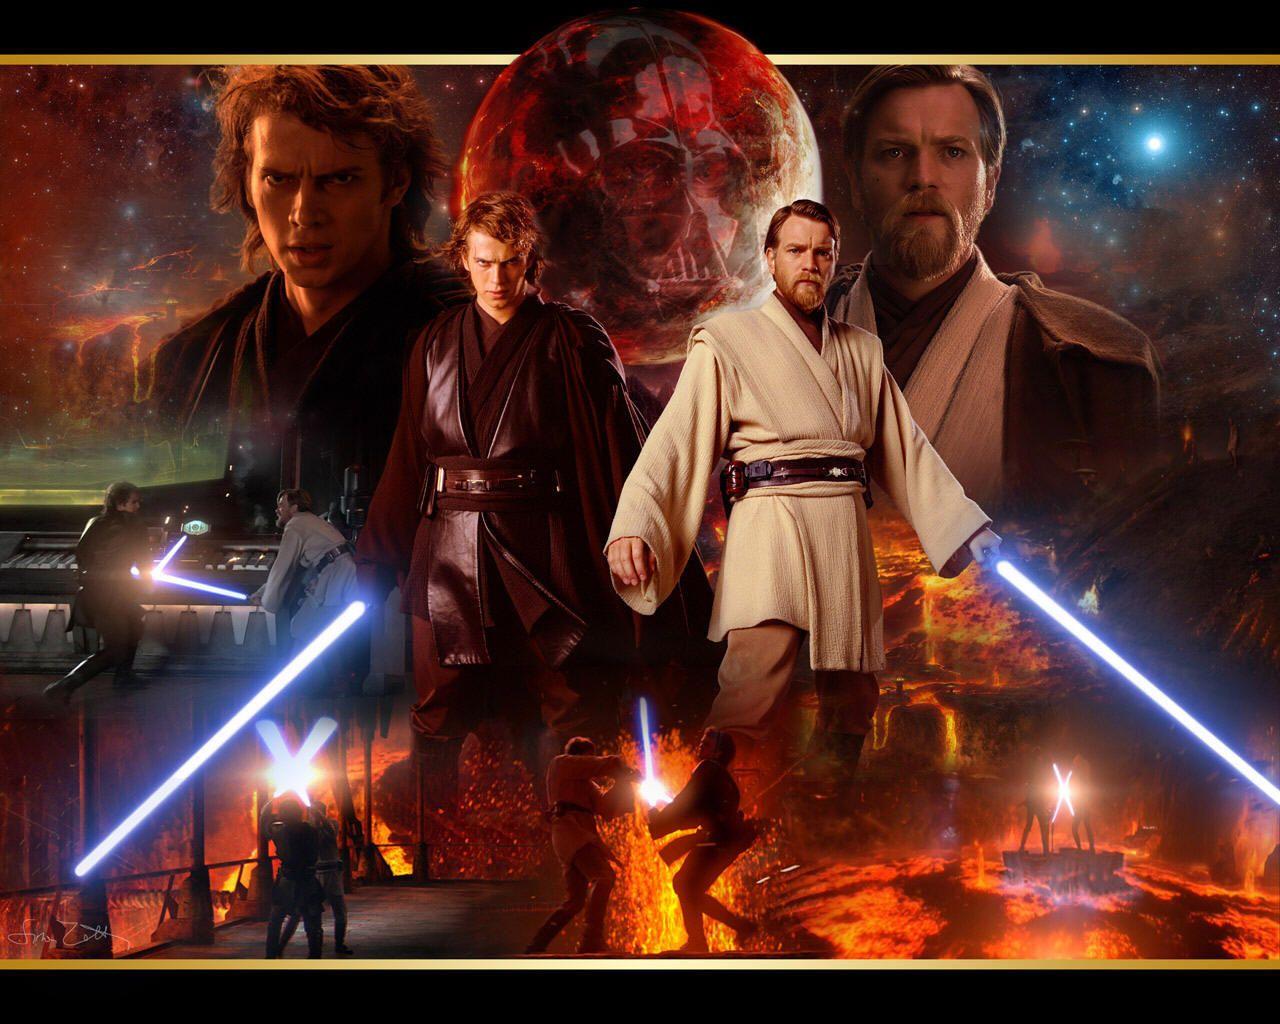 Star Wars Revenge Of The Sith Greatest Work Of Art Papel De Parede Star Wars Star Wars Poster Star Wars